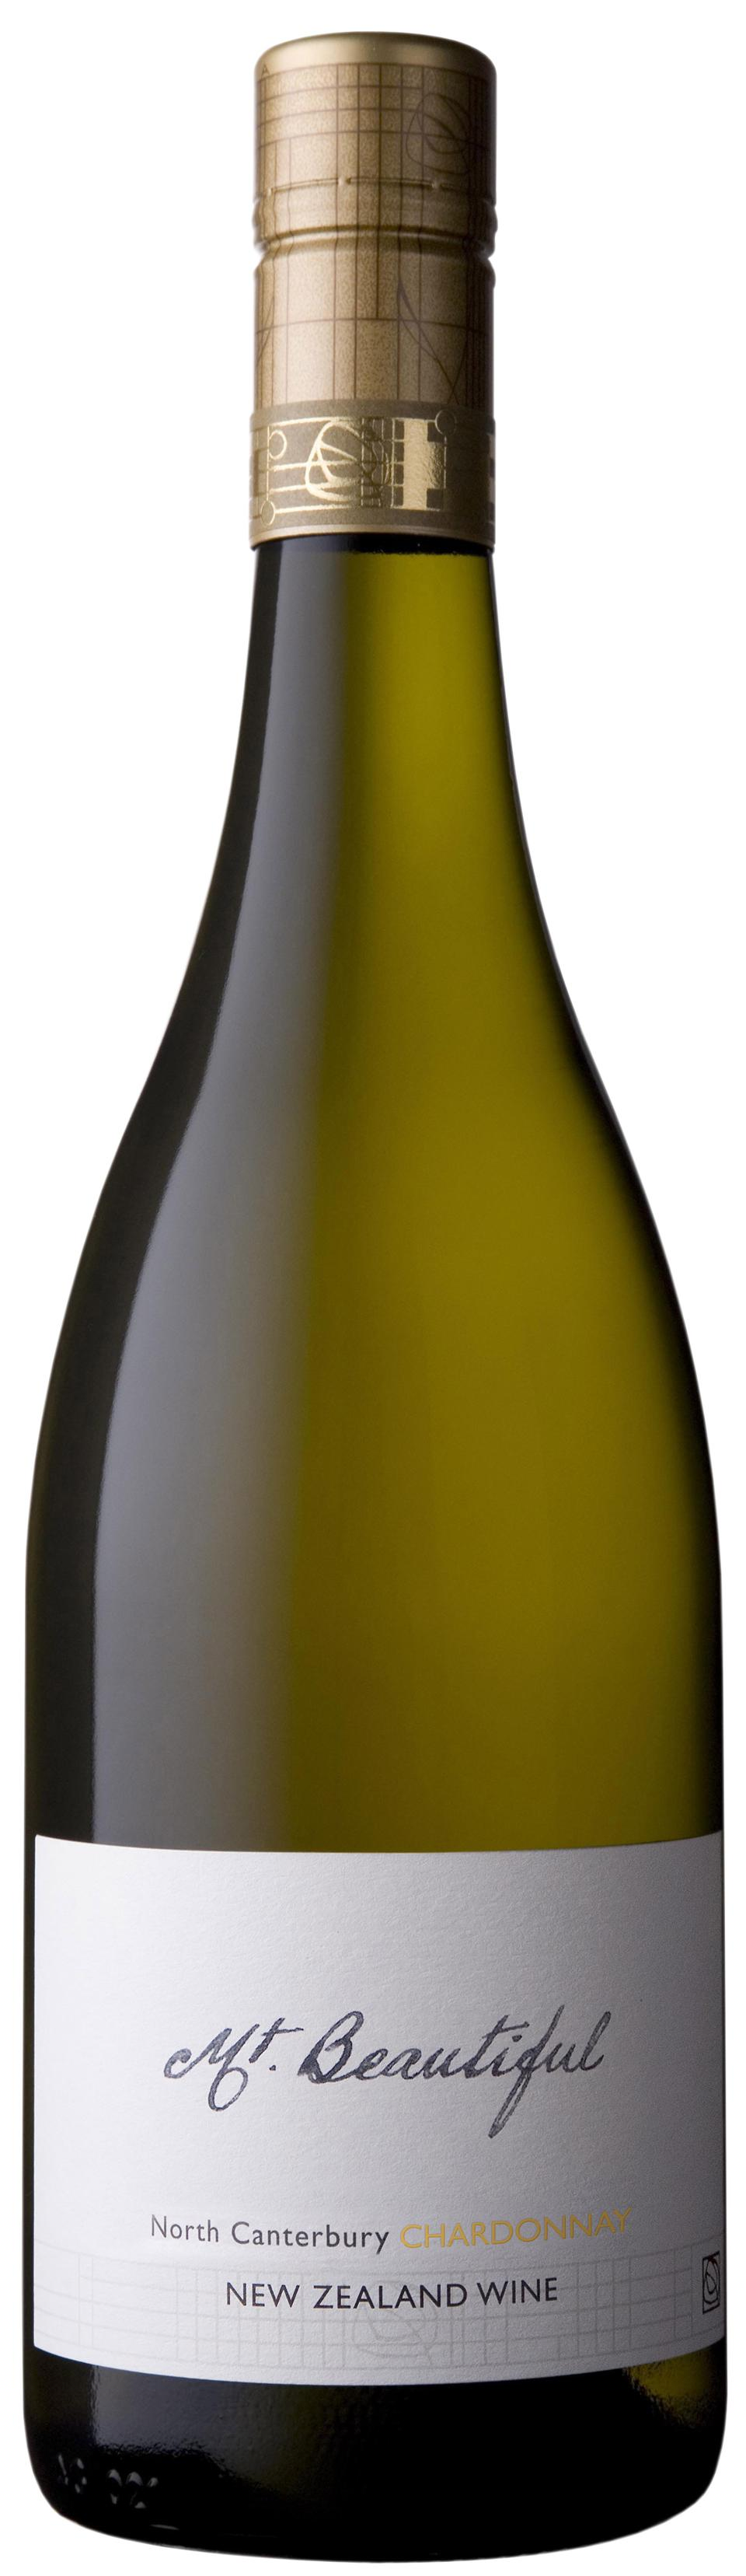 Bottle of Mt. Beautiful New Zealand Chardonnay